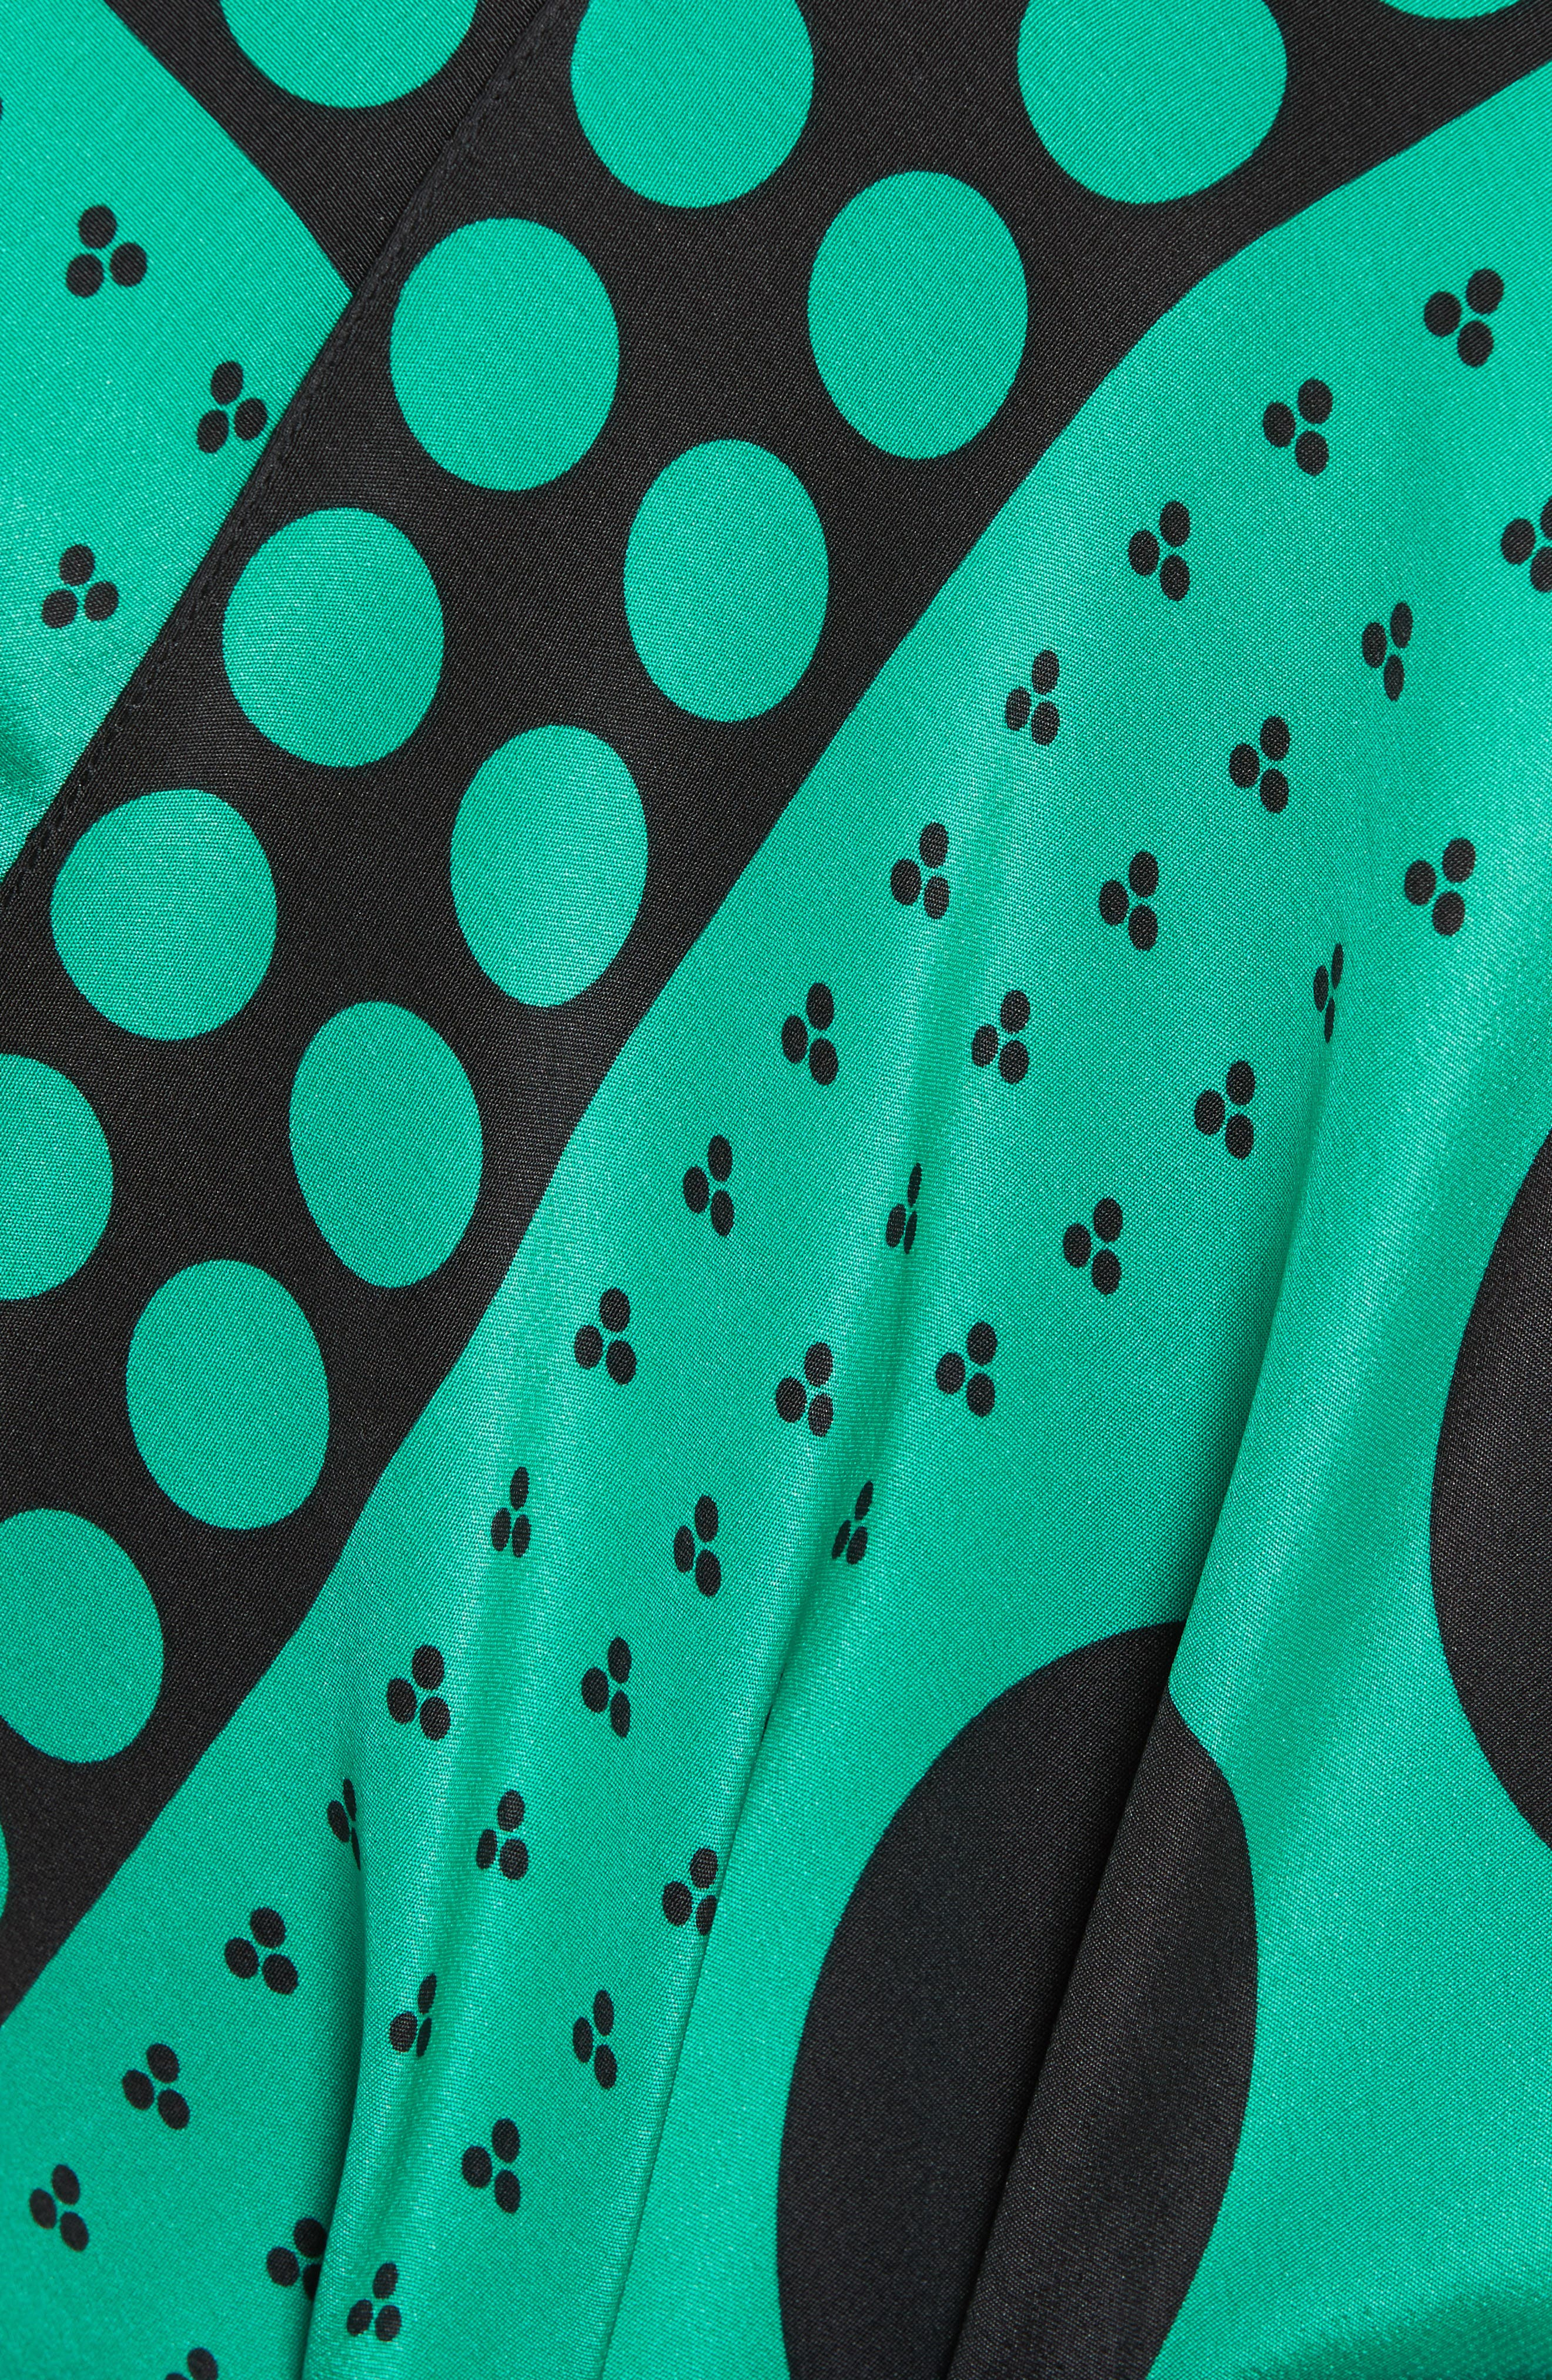 Asymmetrical Scarf Maxi Dress,                             Alternate thumbnail 5, color,                             Brunel Navy/ Evergreen